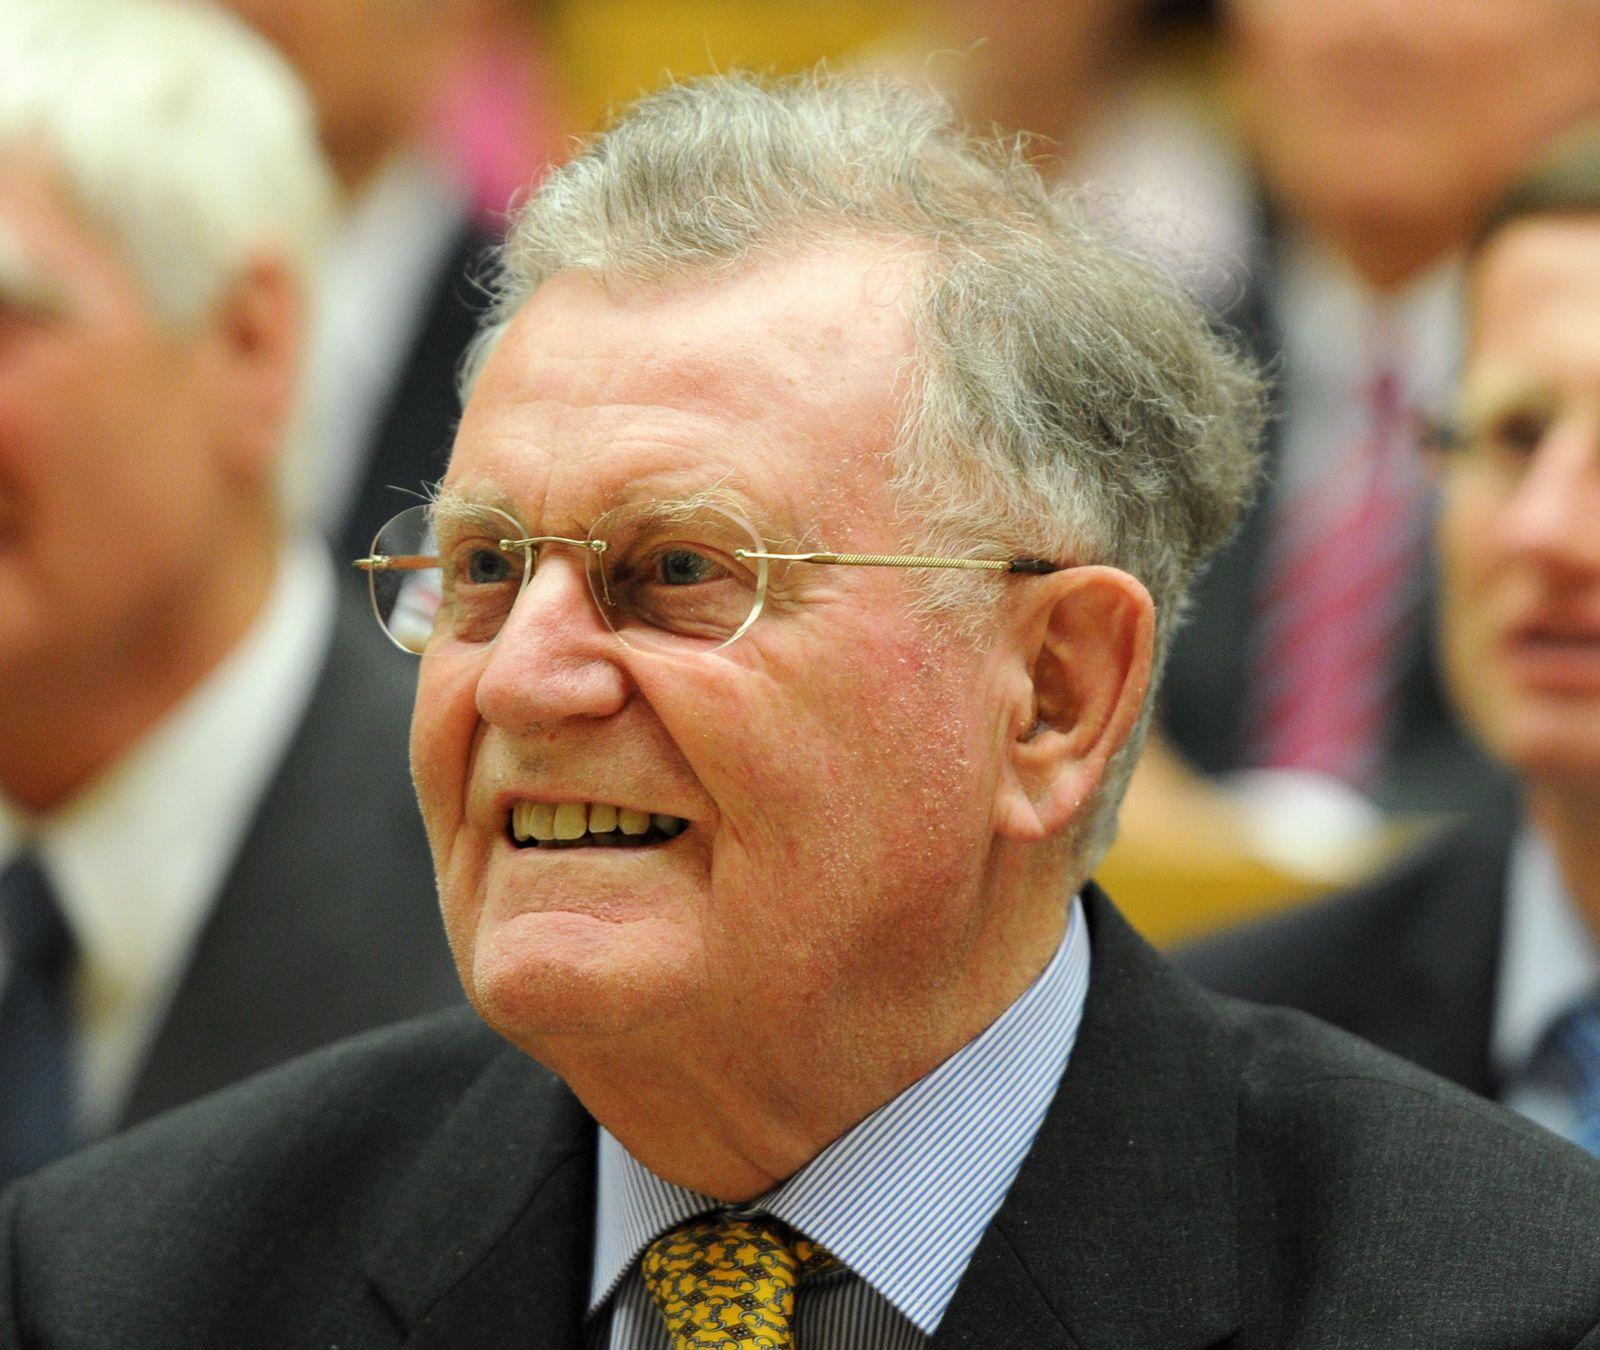 Erwin Teufel